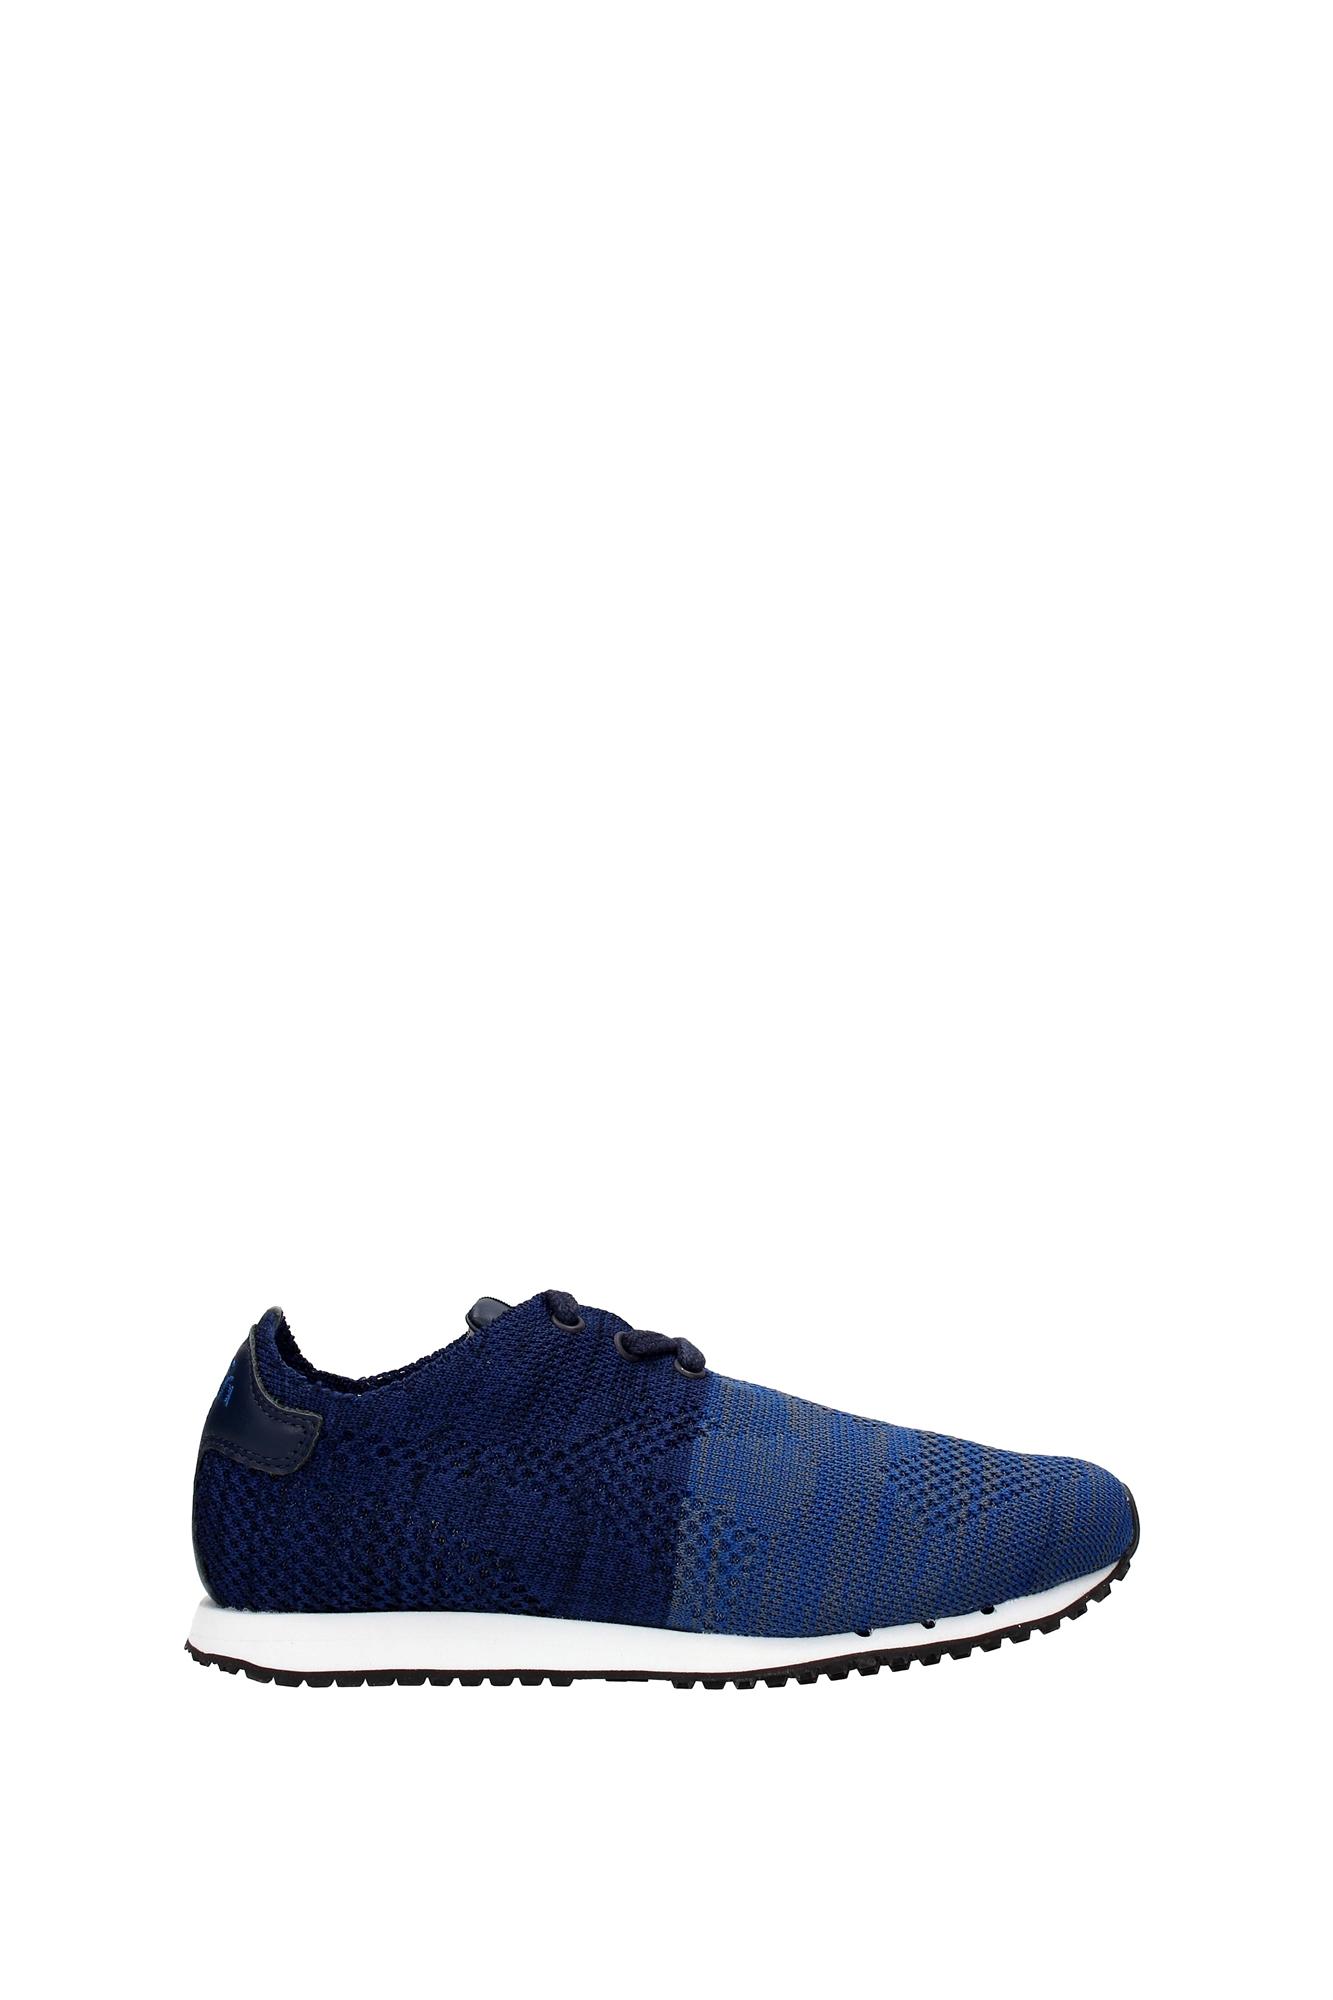 Sneakers Diadora Uomo Heritage Uomo Diadora - Tessuto (2011705760160065) 55d145